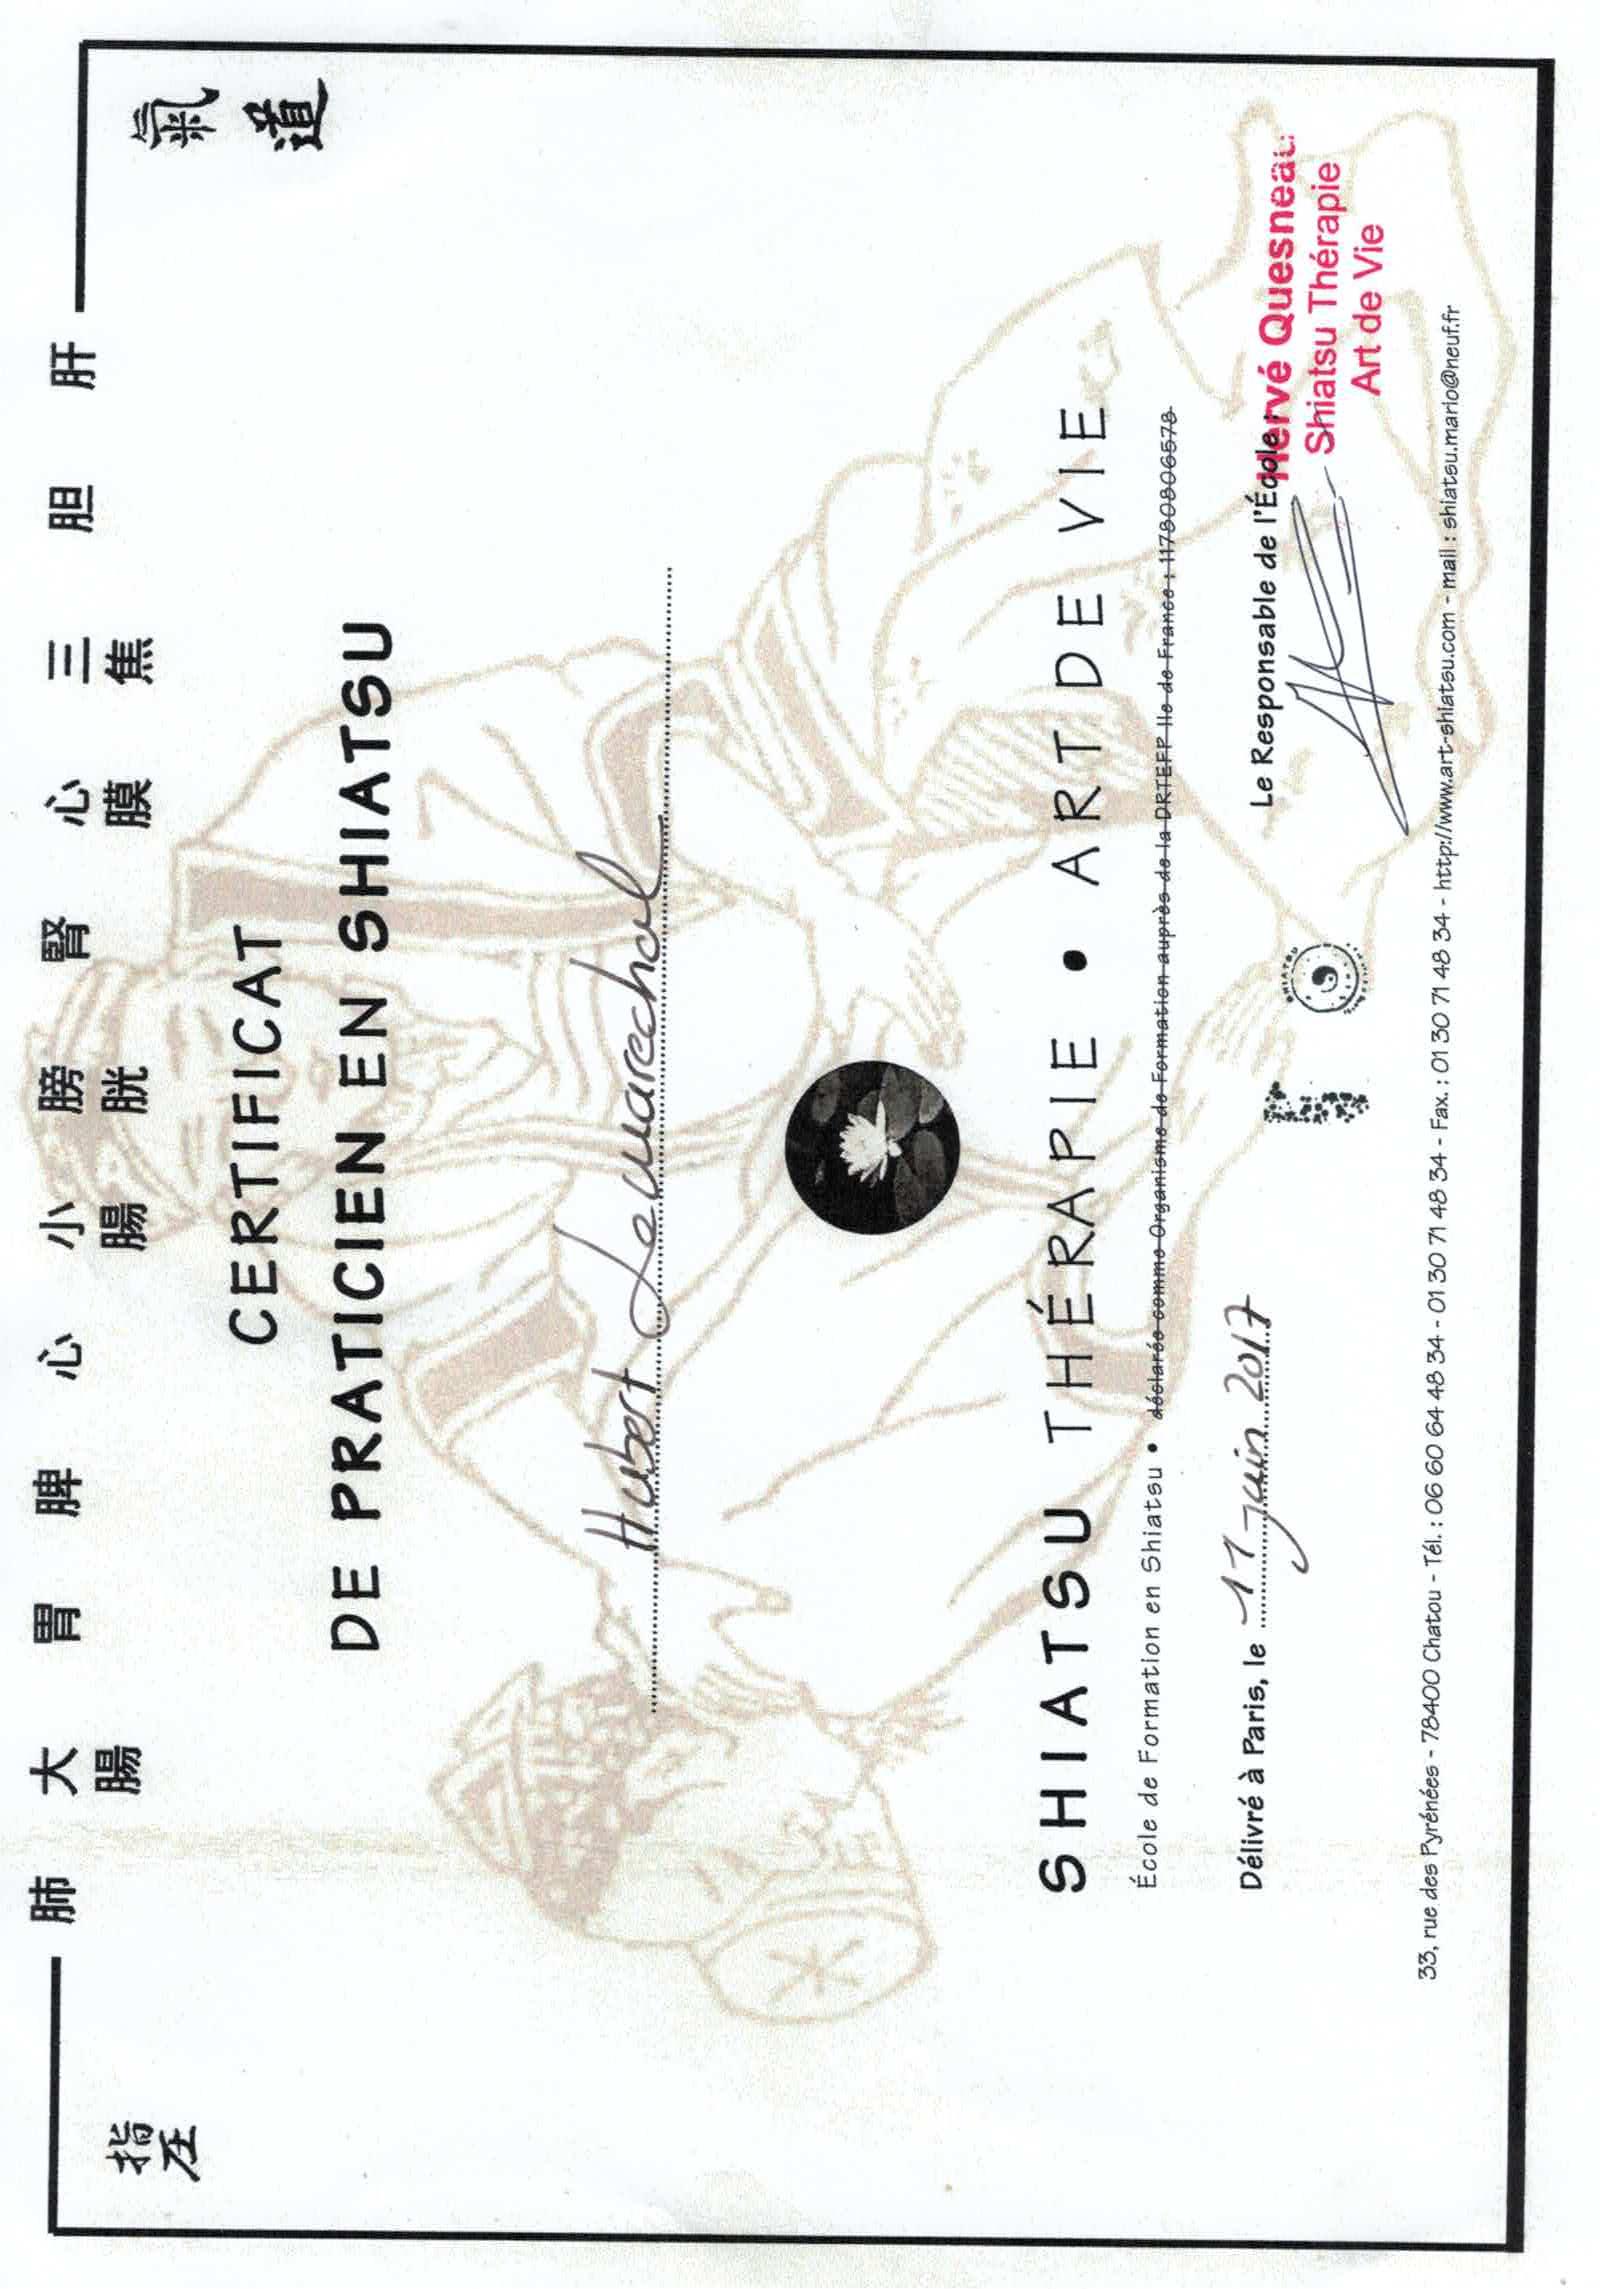 Certificat HL shiatsu Masunaga couleur